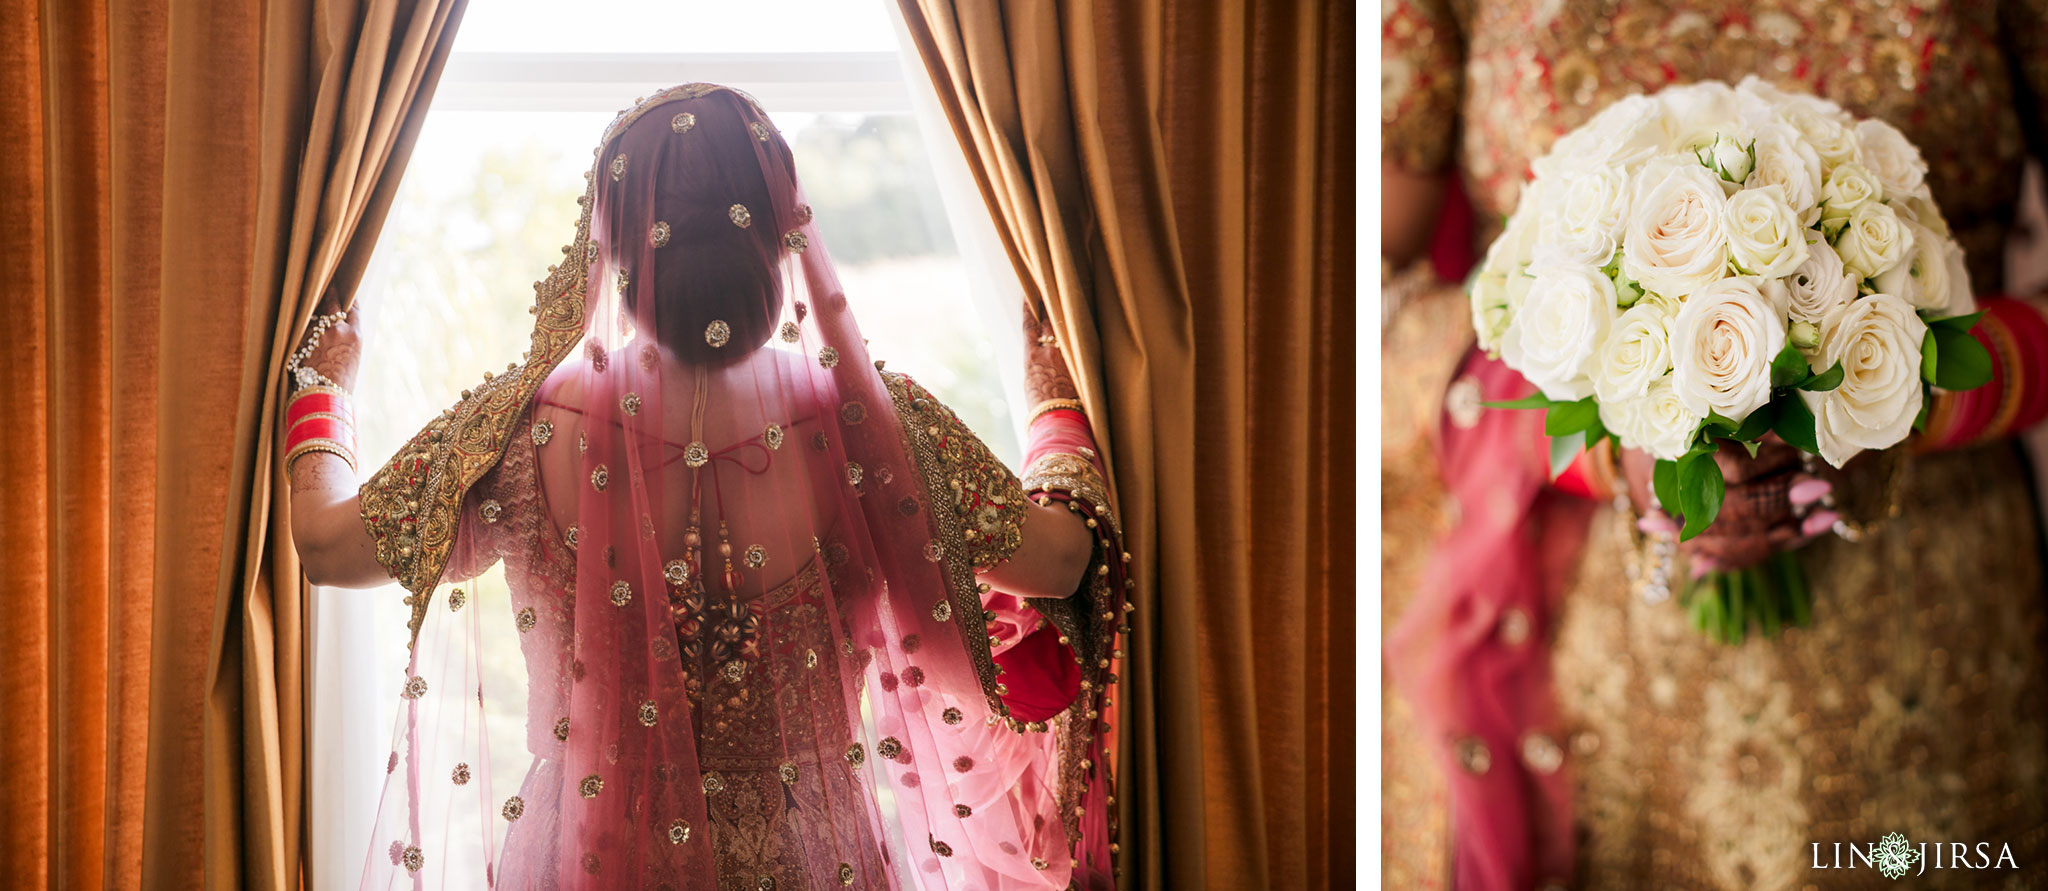 008 san francisco sikh center punjabi wedding photography